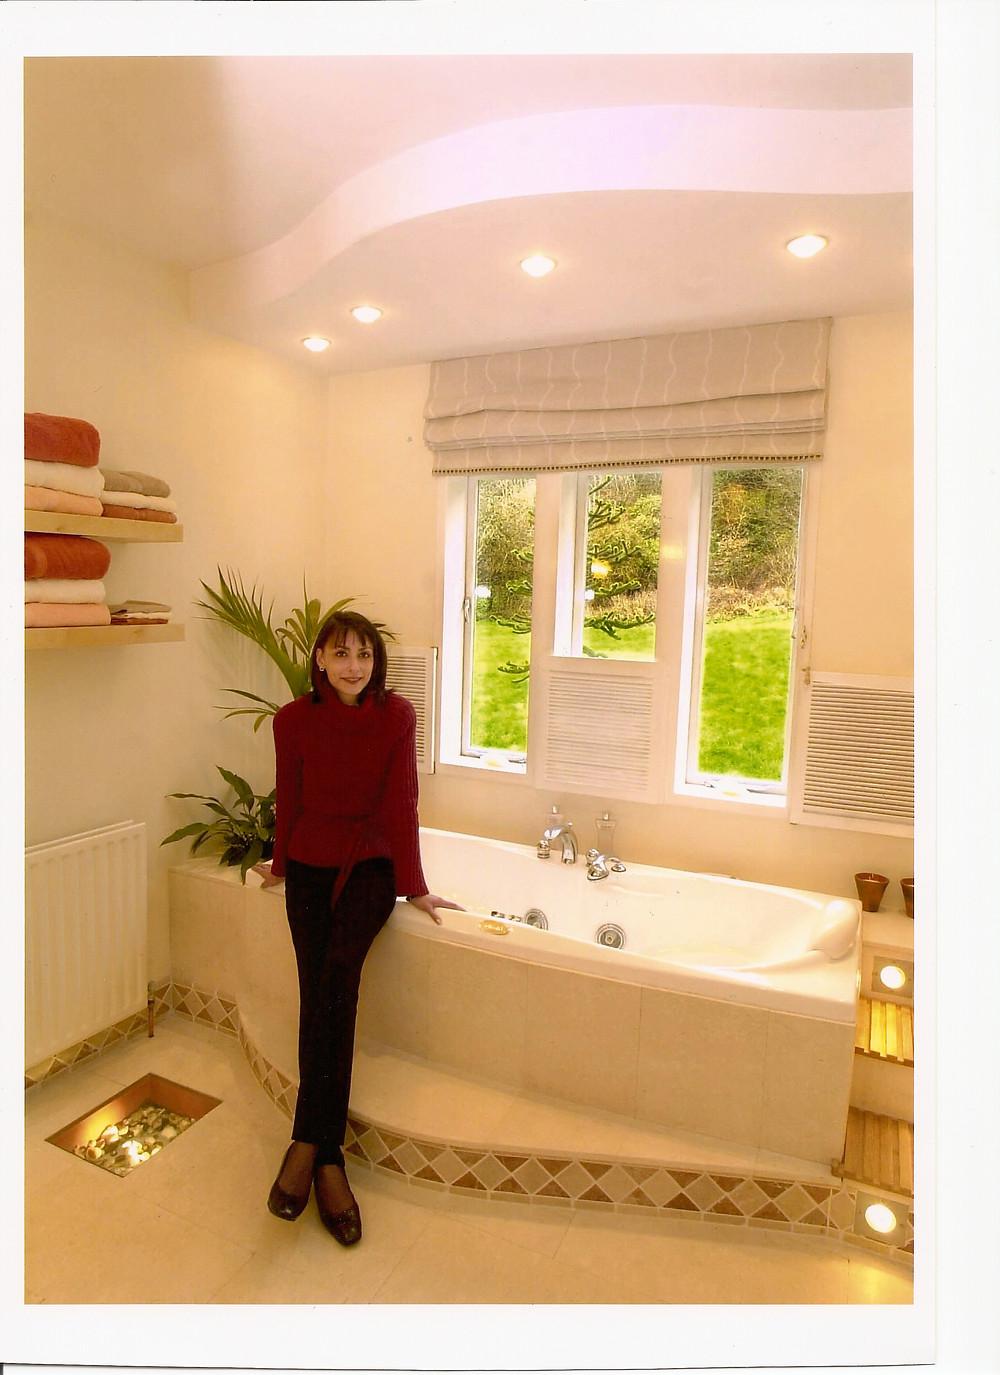 Spa Bathroom Photo Courtesy of Nina Kati